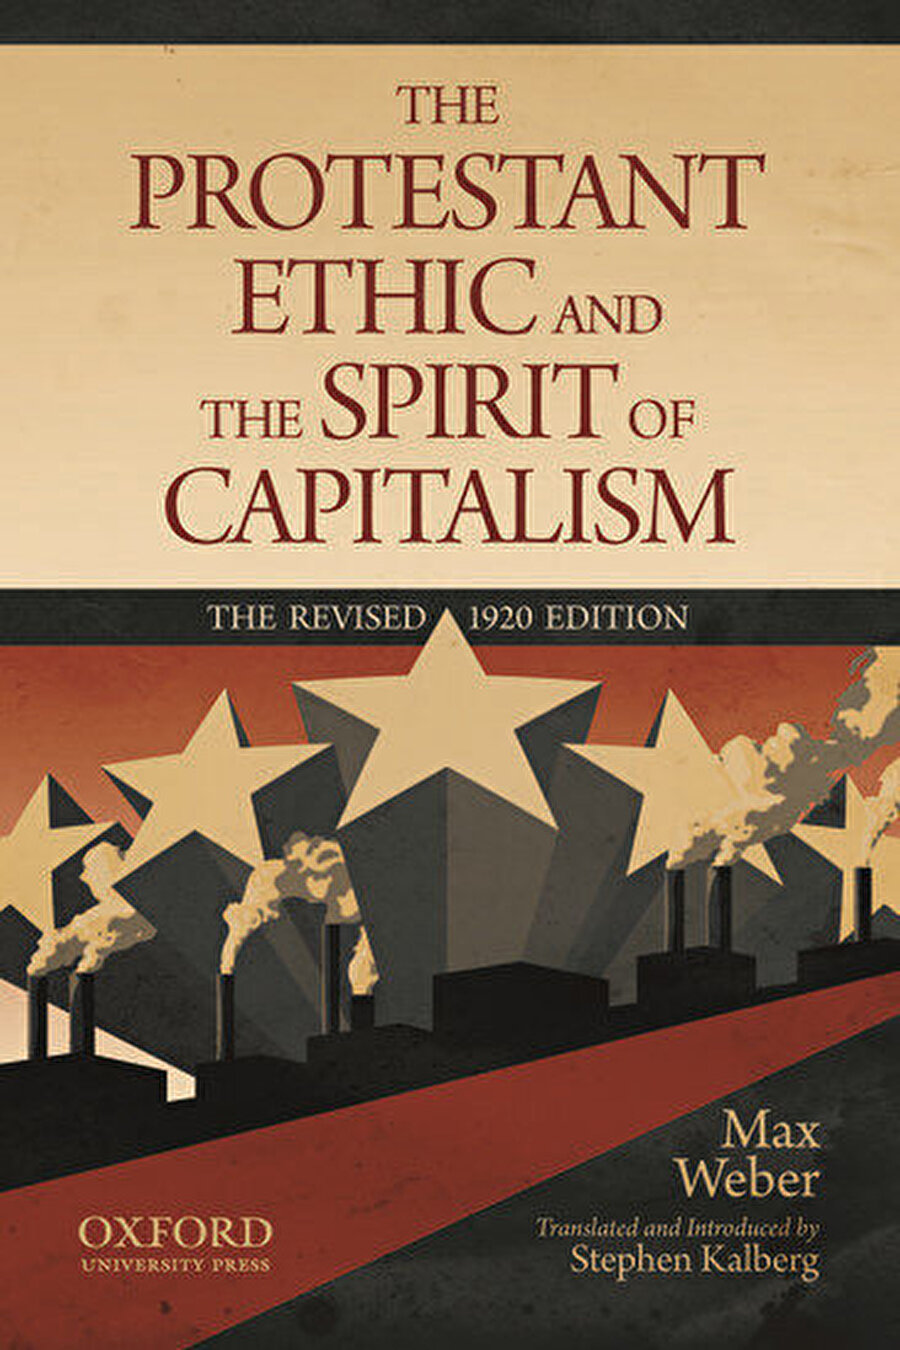 Protestan Ahlakı ve Kapitalizmin Ruhu, Max Weber